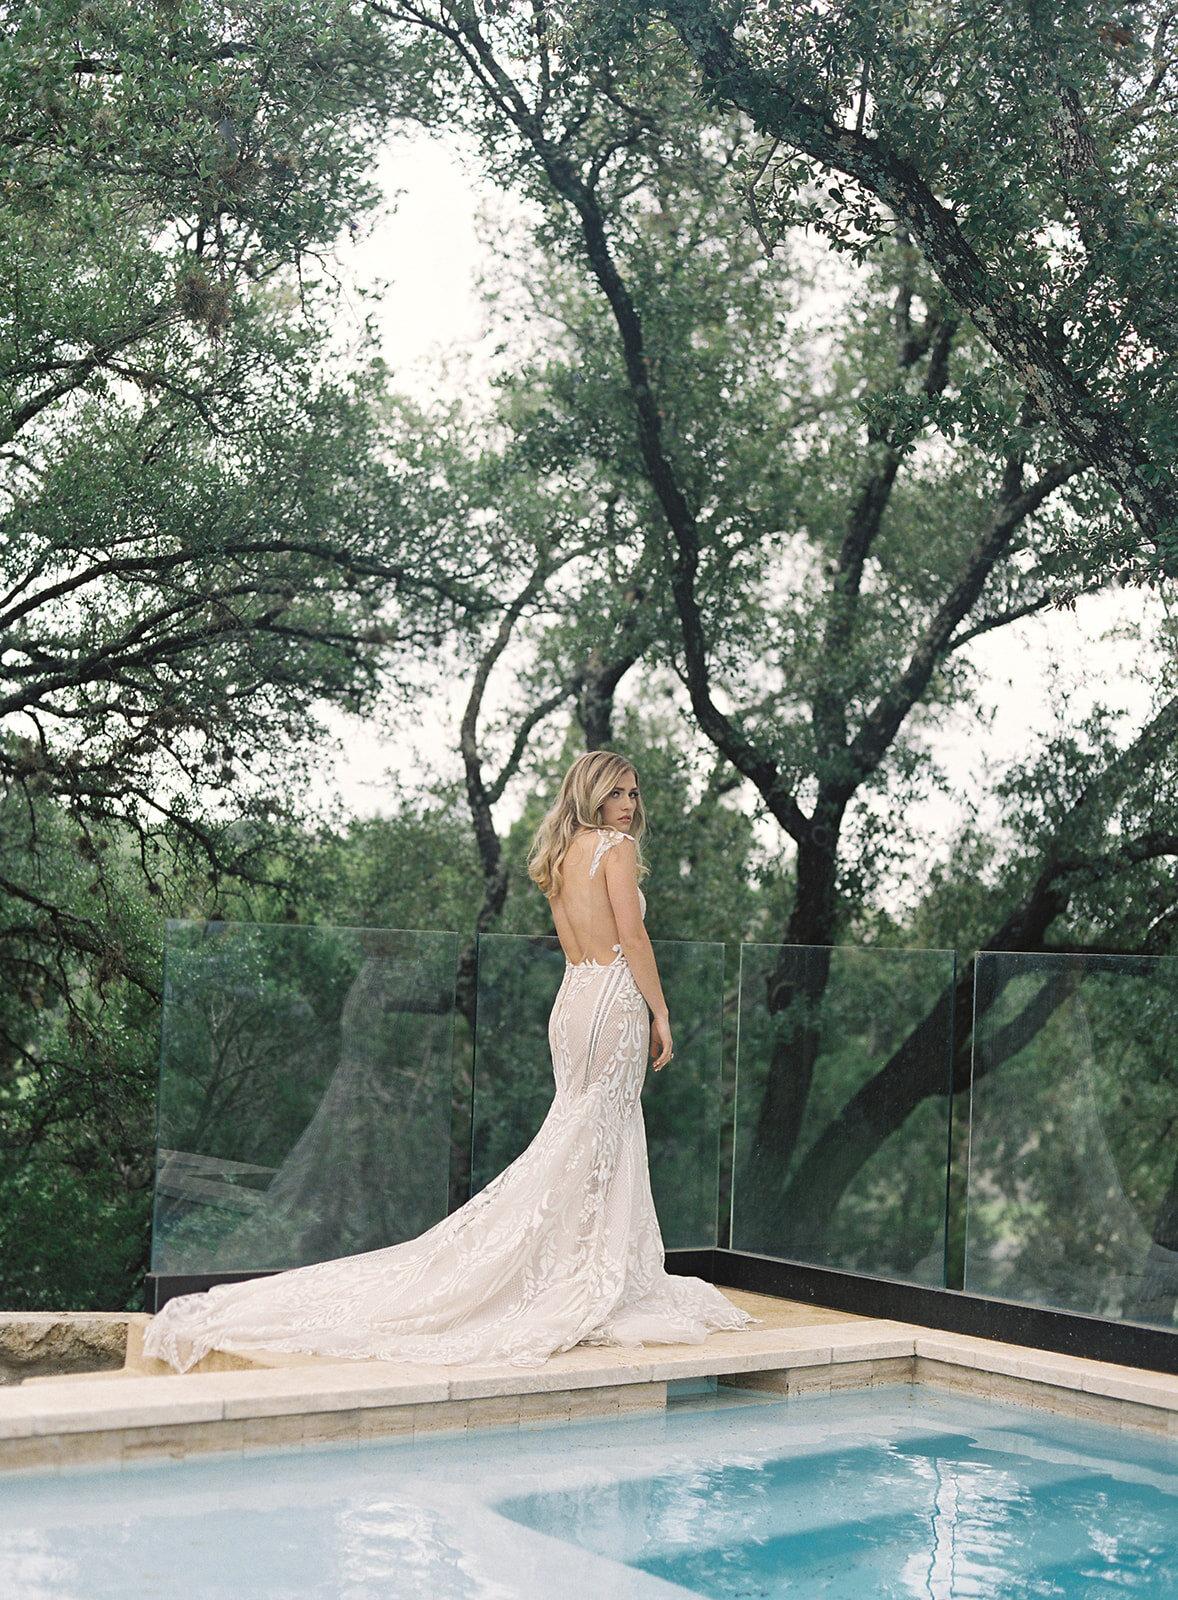 Austin_Editorial-Carrie_King_Photographer-117.jpg